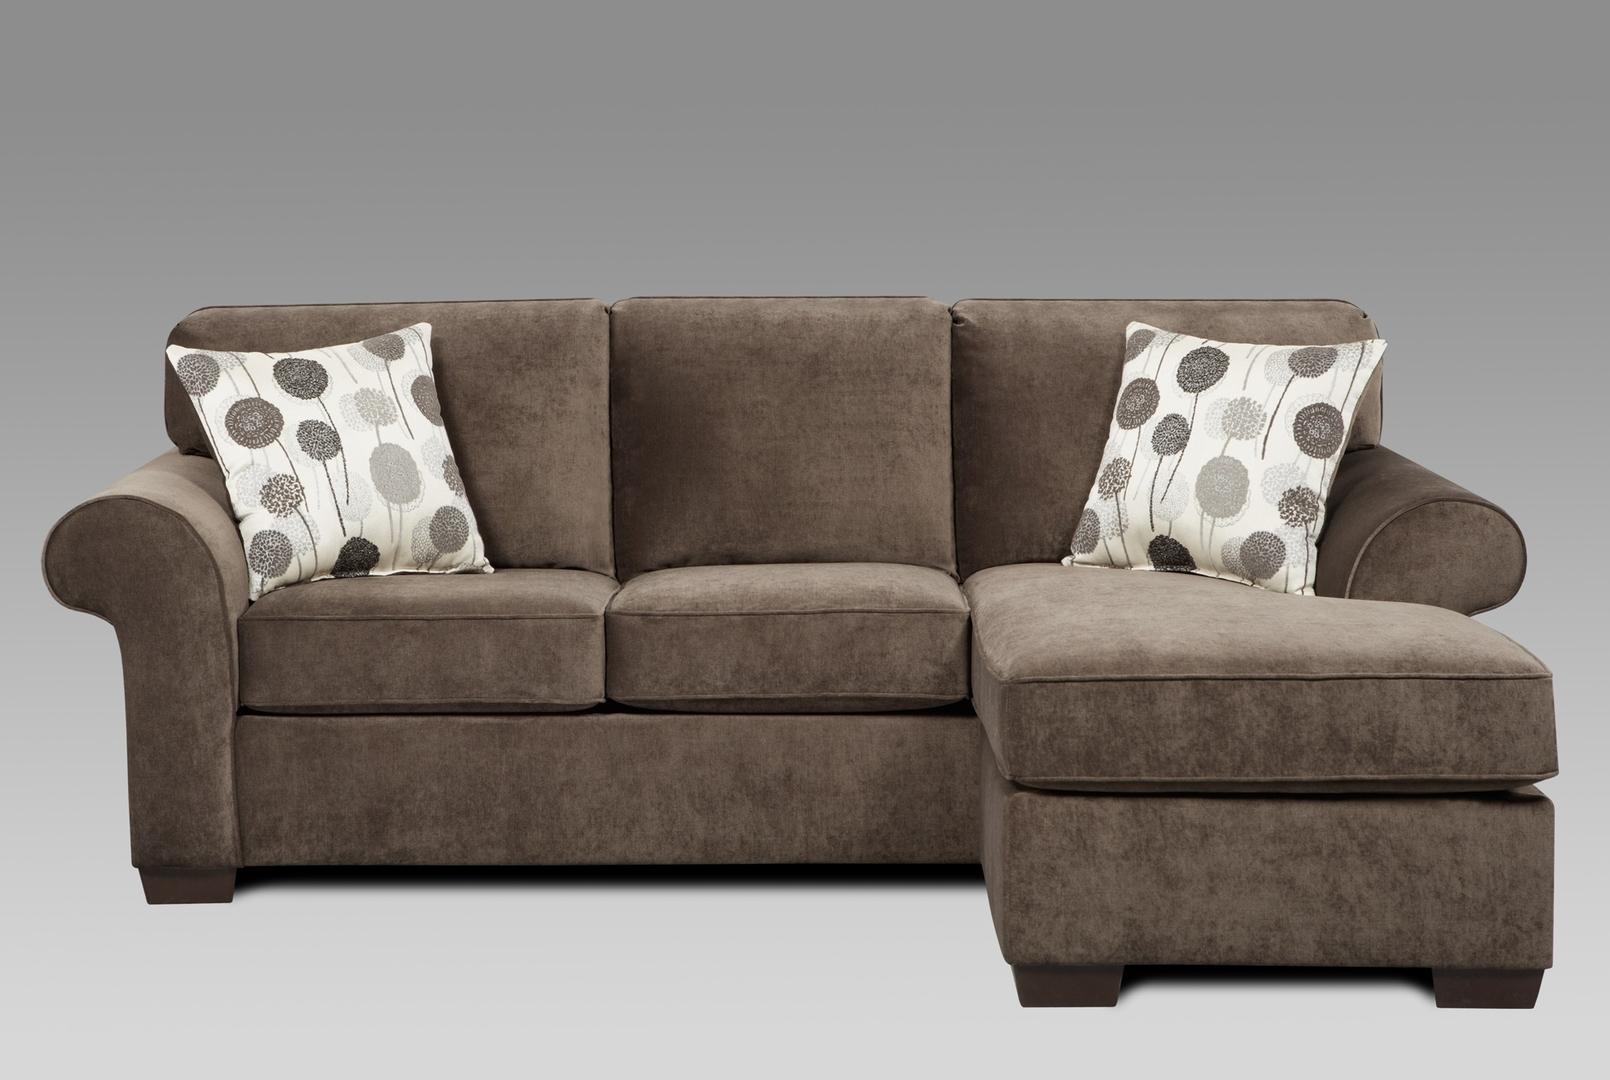 Sofas: Tuscaloosa, Al: Southeastern Furniture For Tuscaloosa Sectional Sofas (Image 8 of 10)